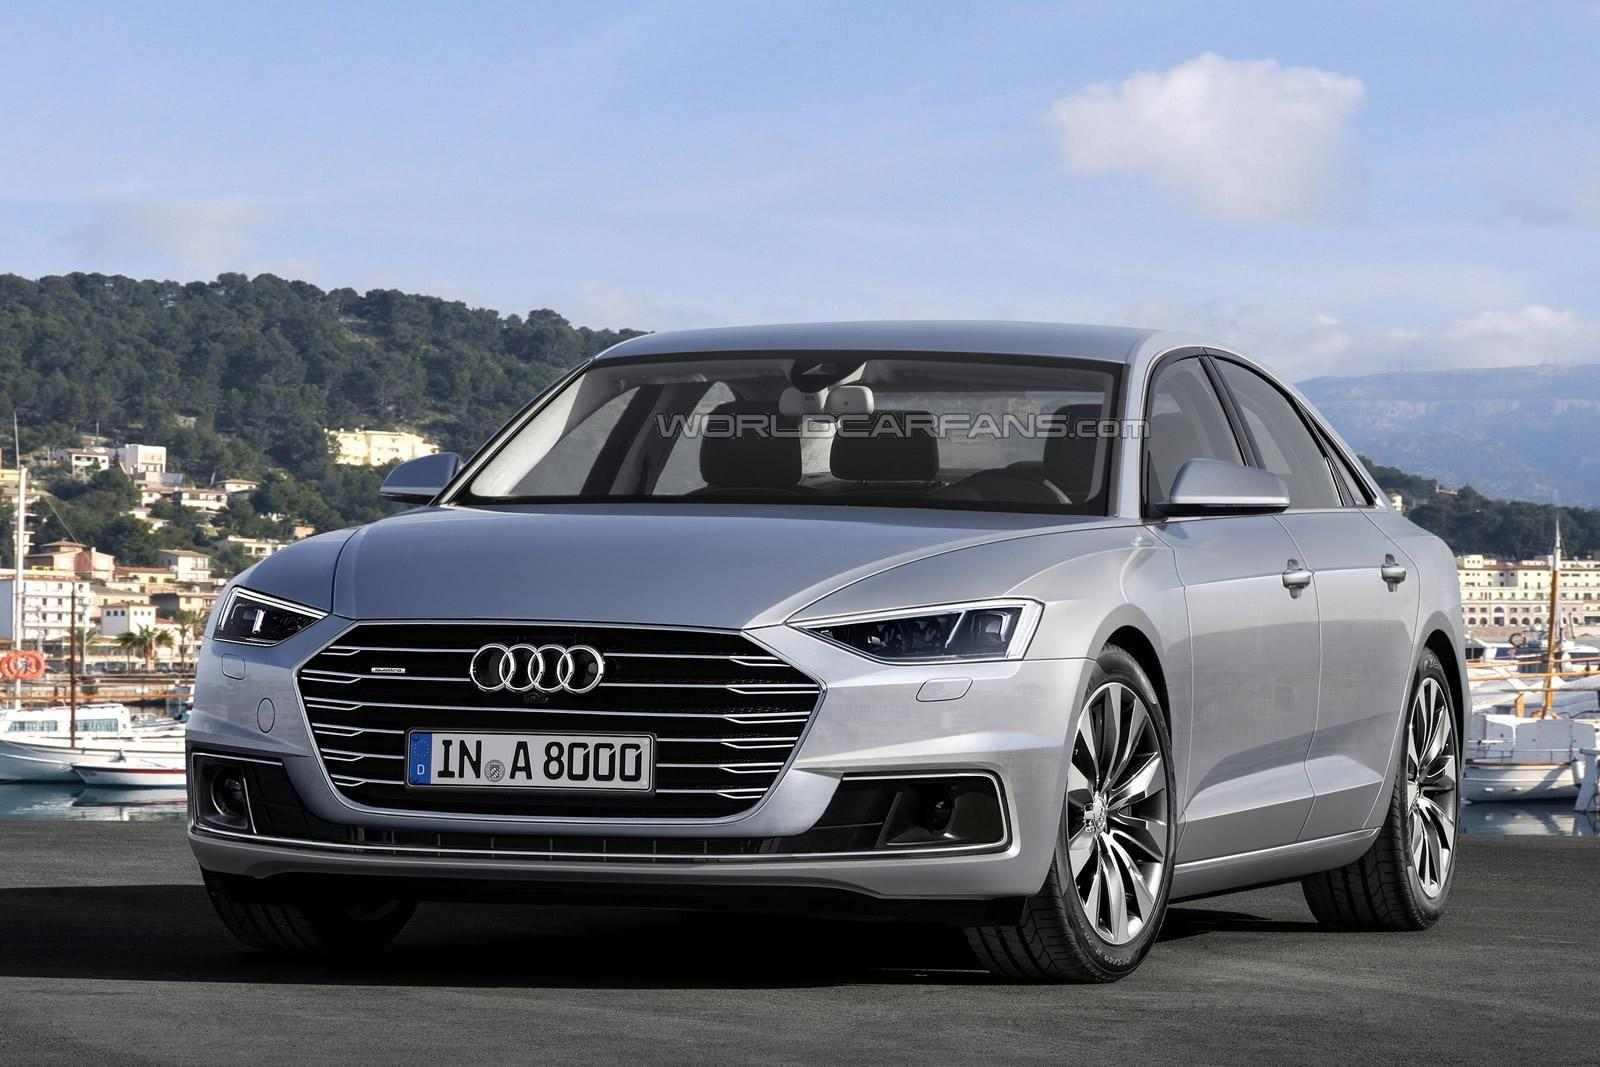 New Audi A8 render